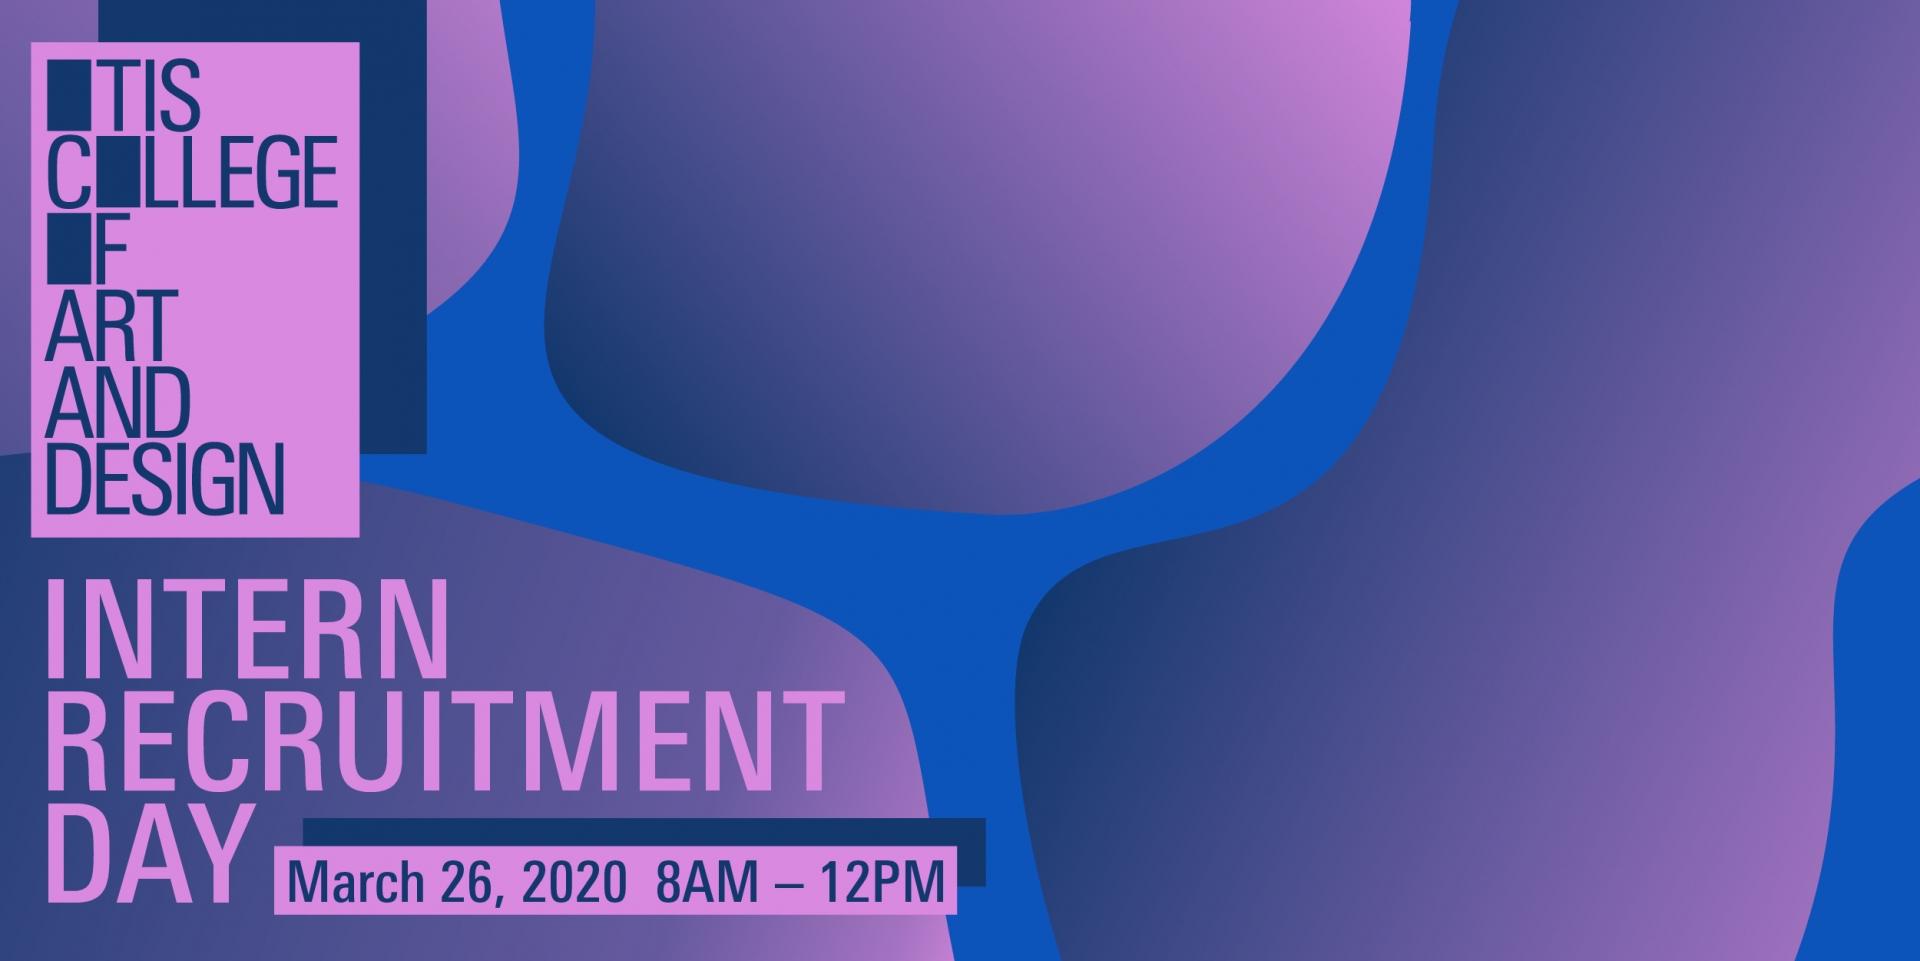 2020 Intern Recruitment Day